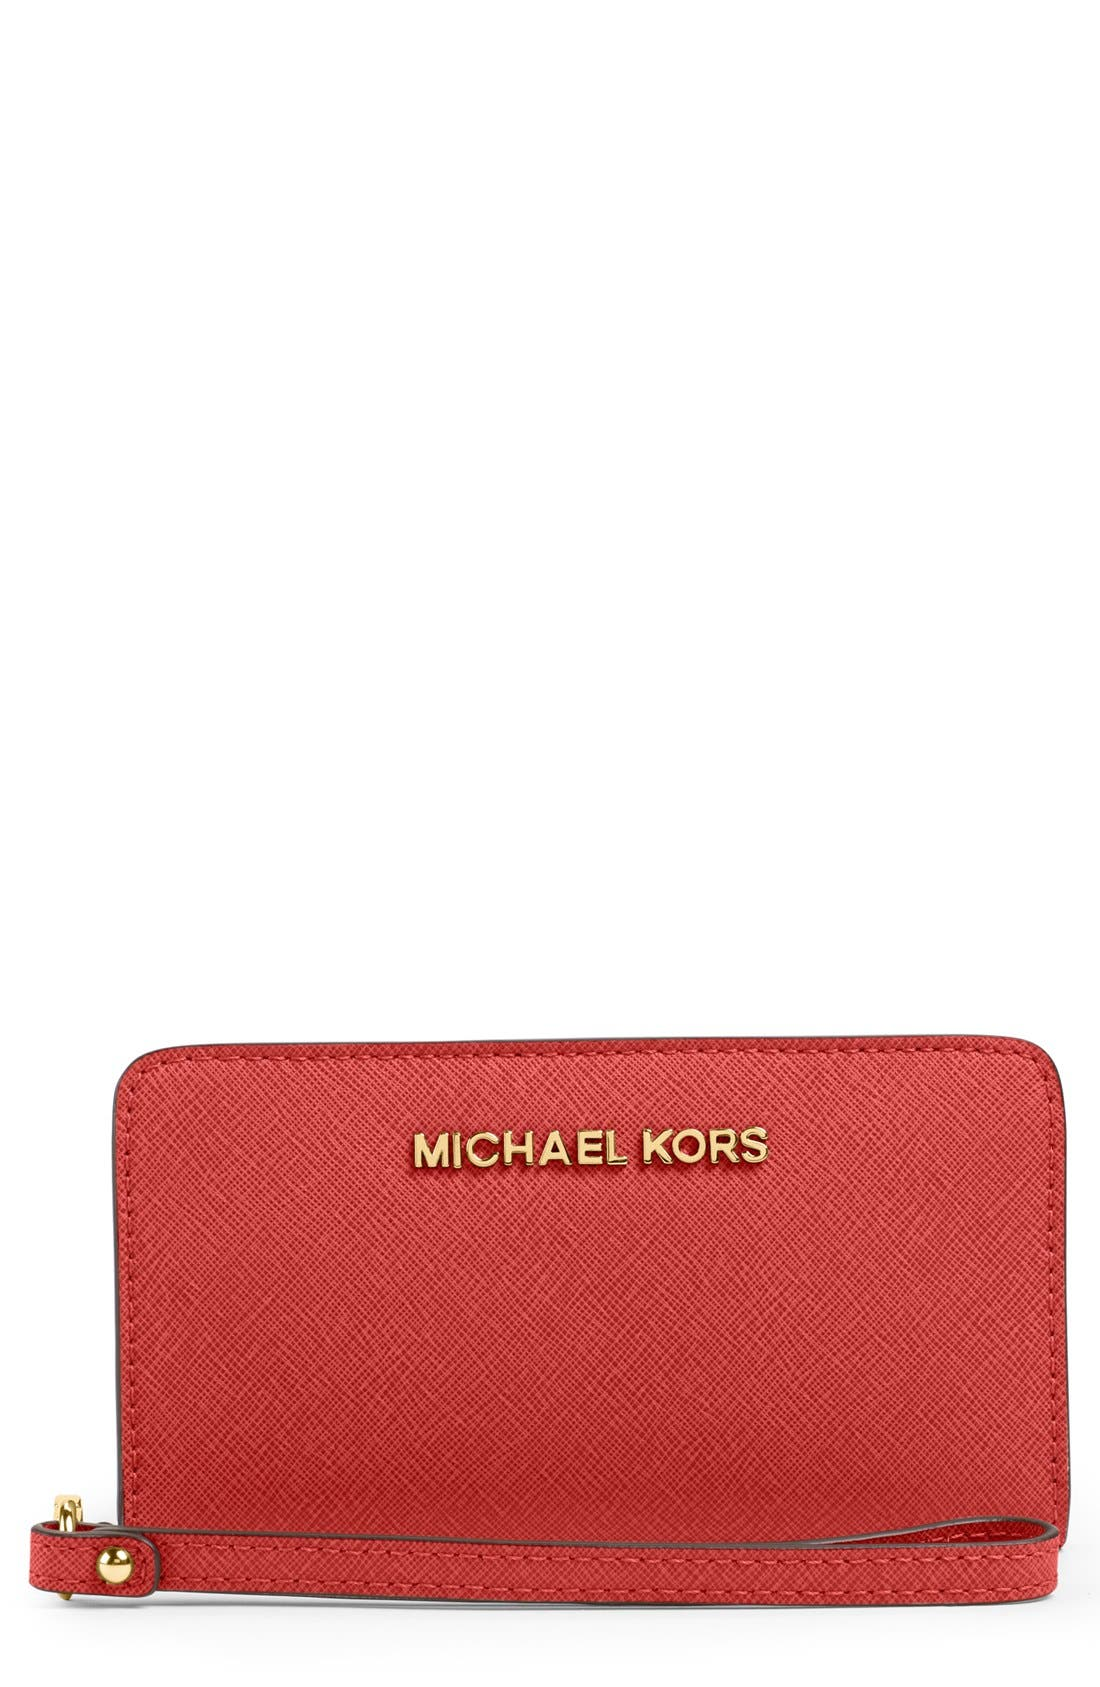 Main Image - MICHAEL Michael Kors Saffiano Leather Tech Wristlet